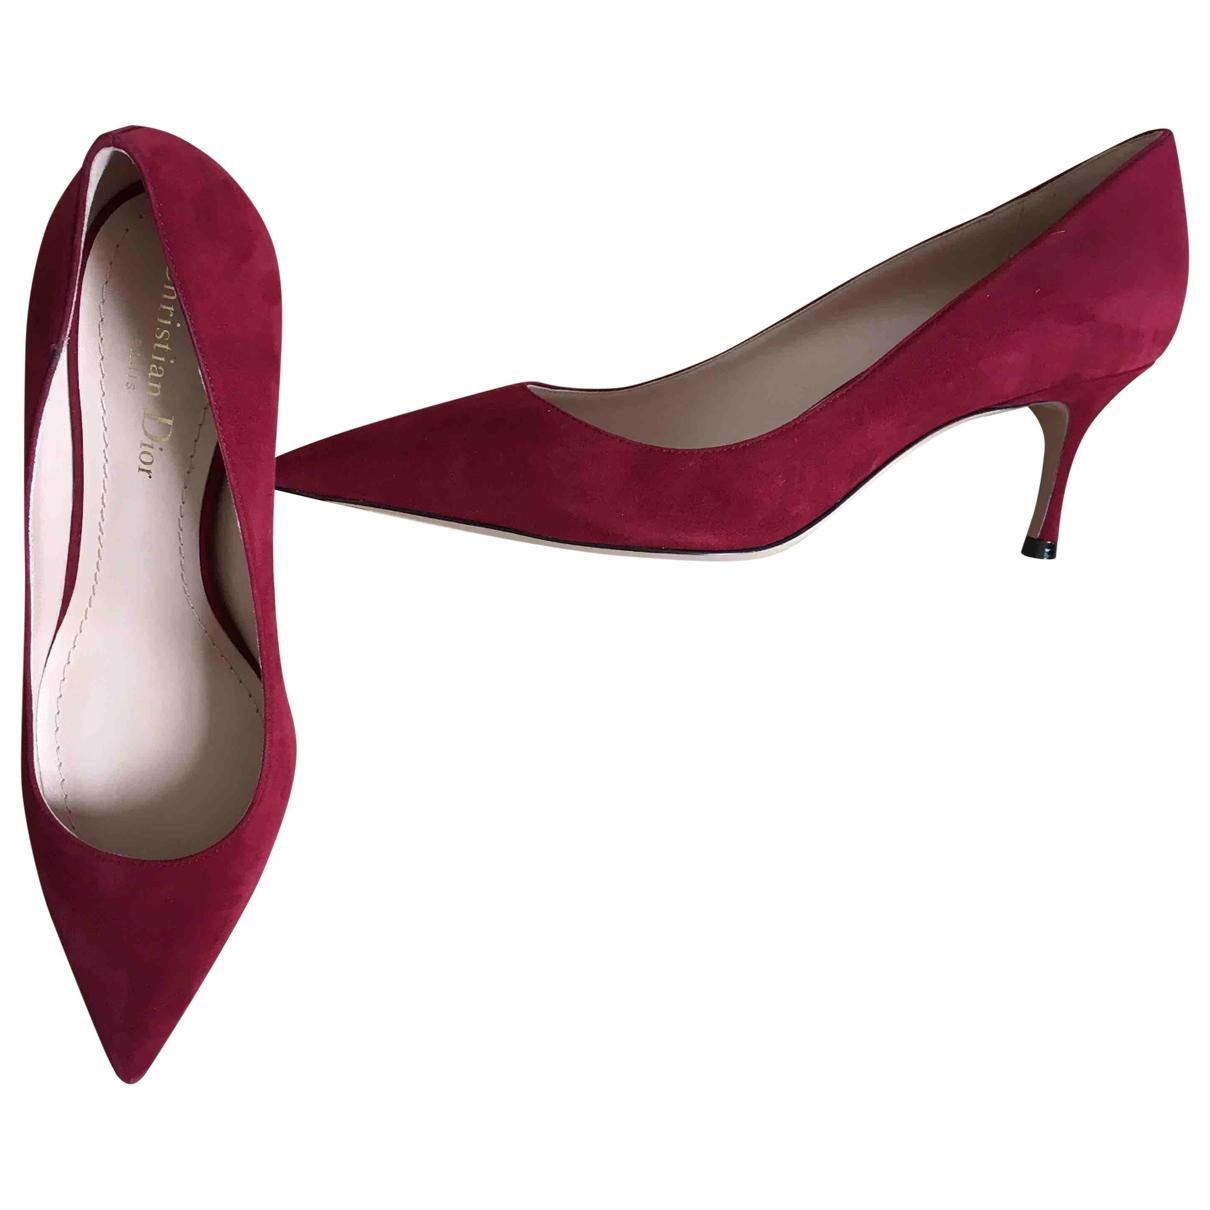 Dior Dior D-Stiletto Red Suede Heels for Women 38 EU